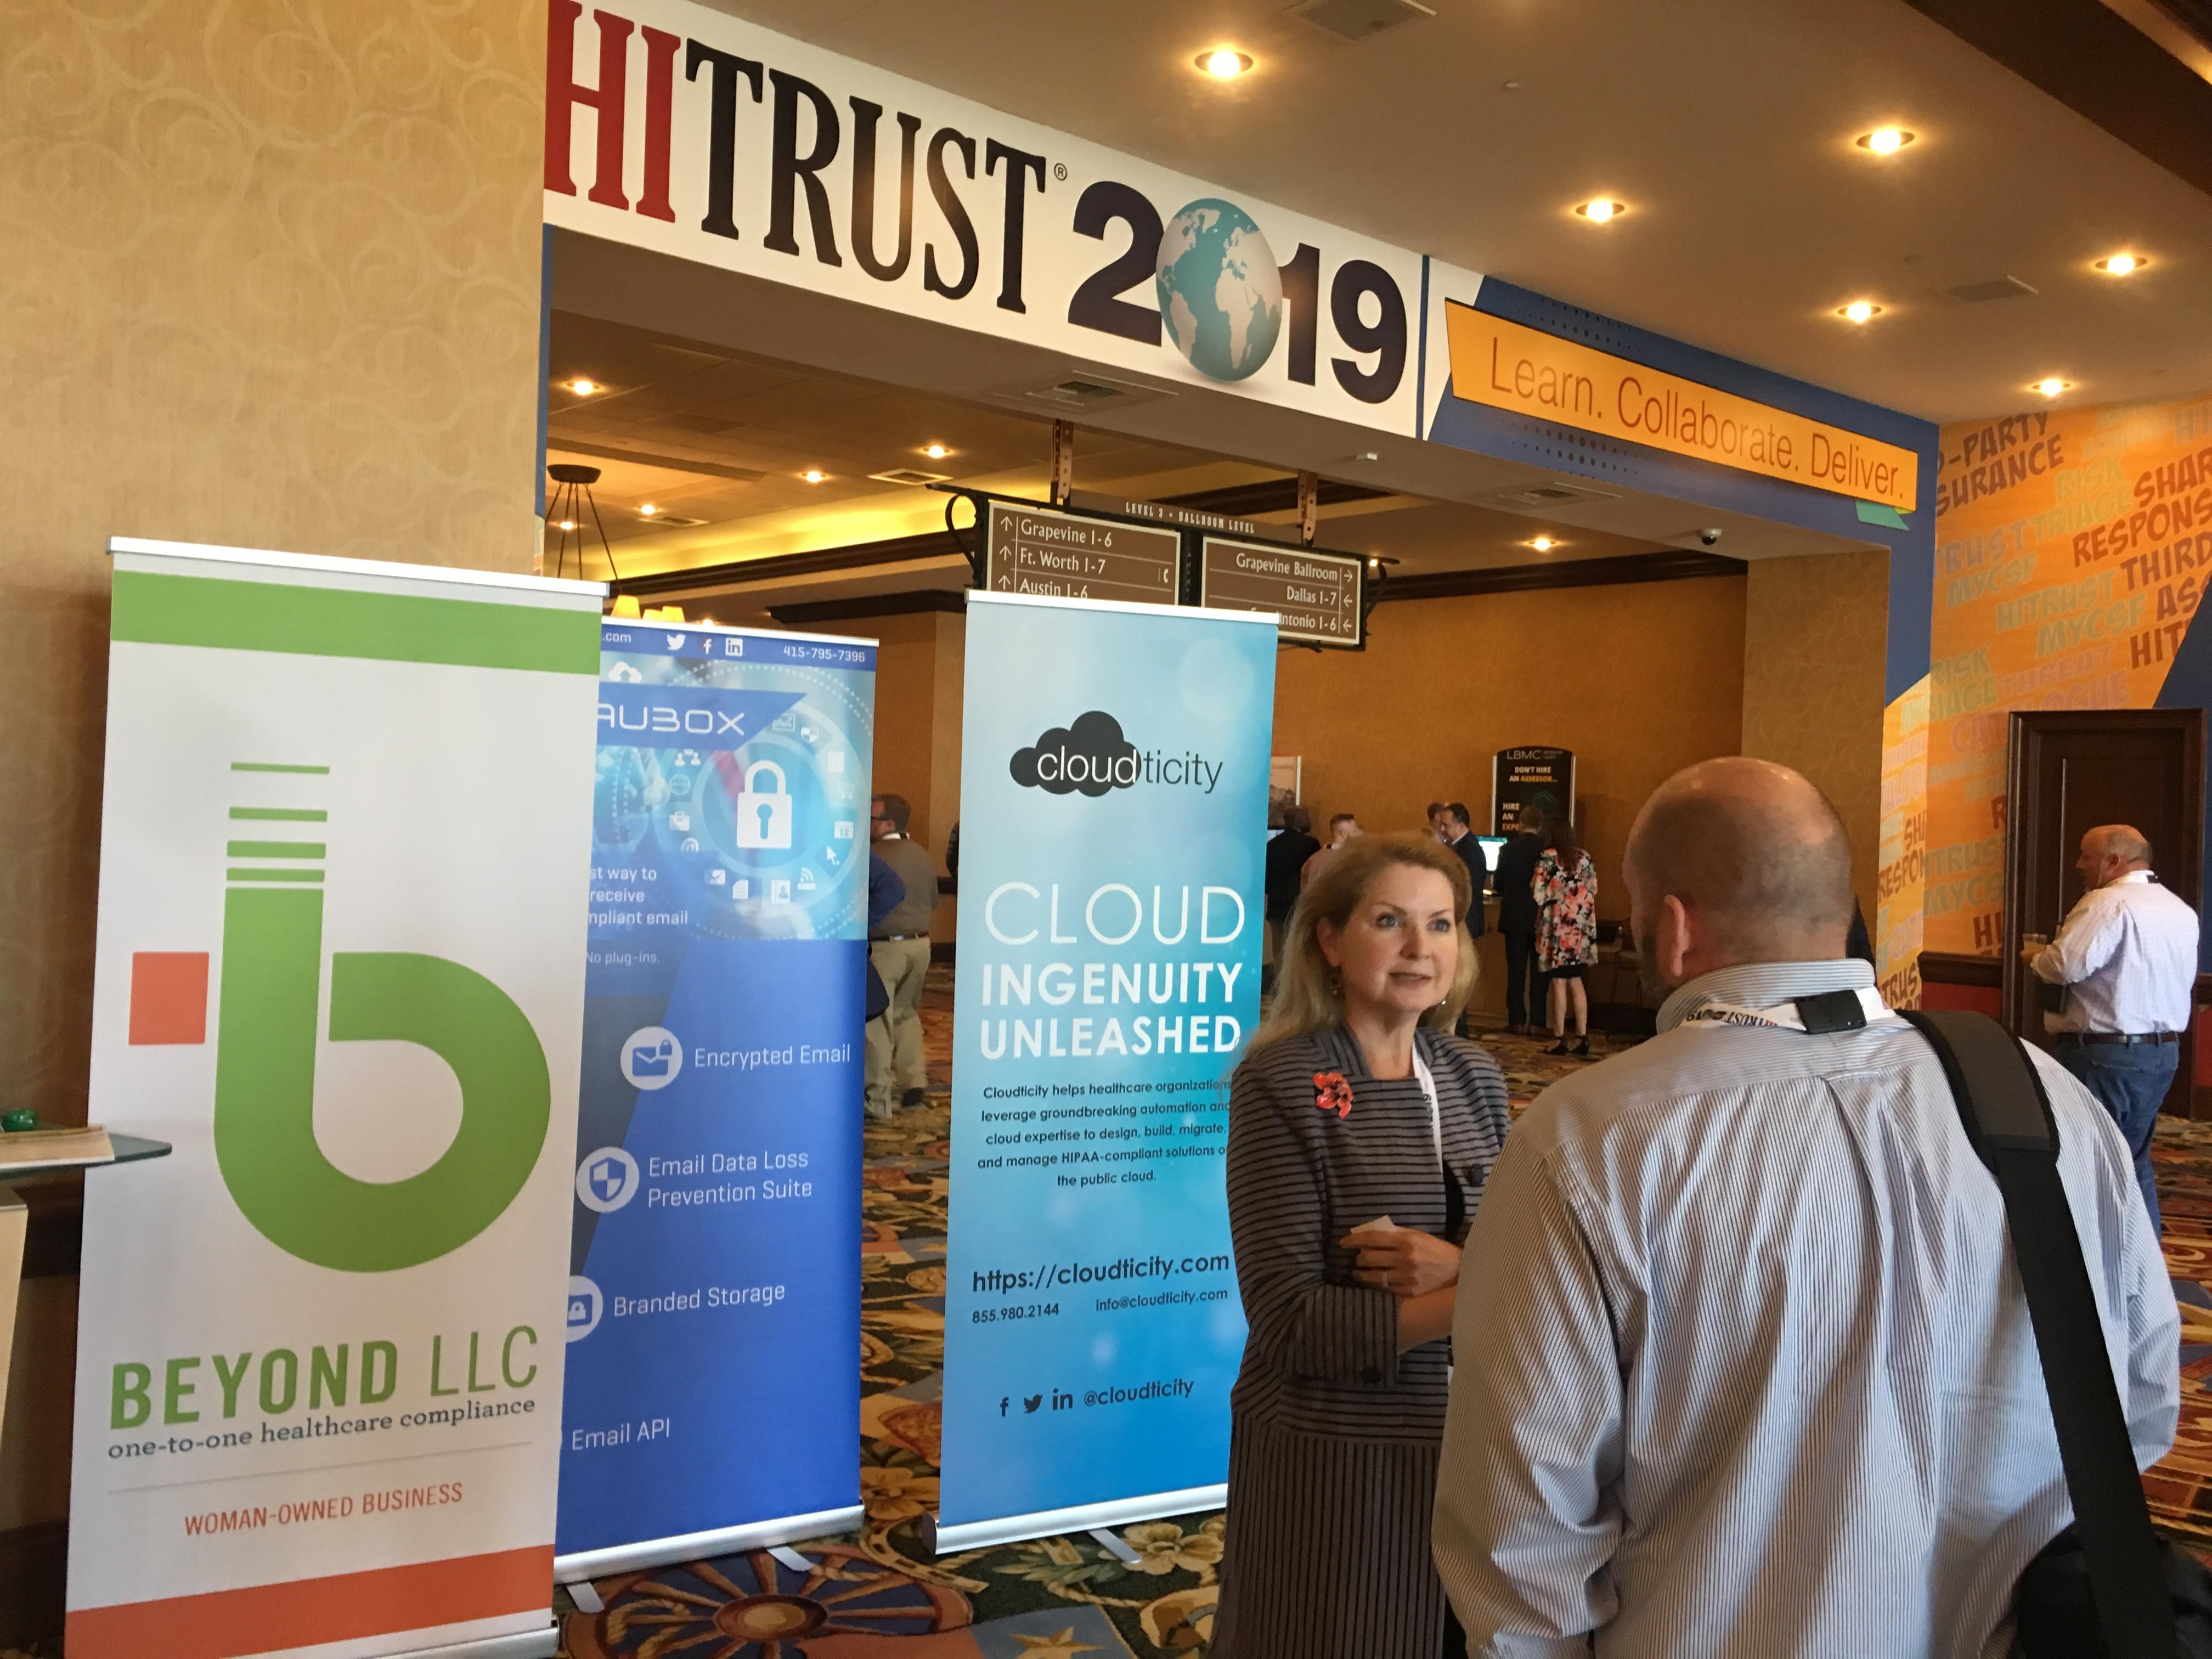 Cathlynn Nigh - HITRUST 2019 Conference